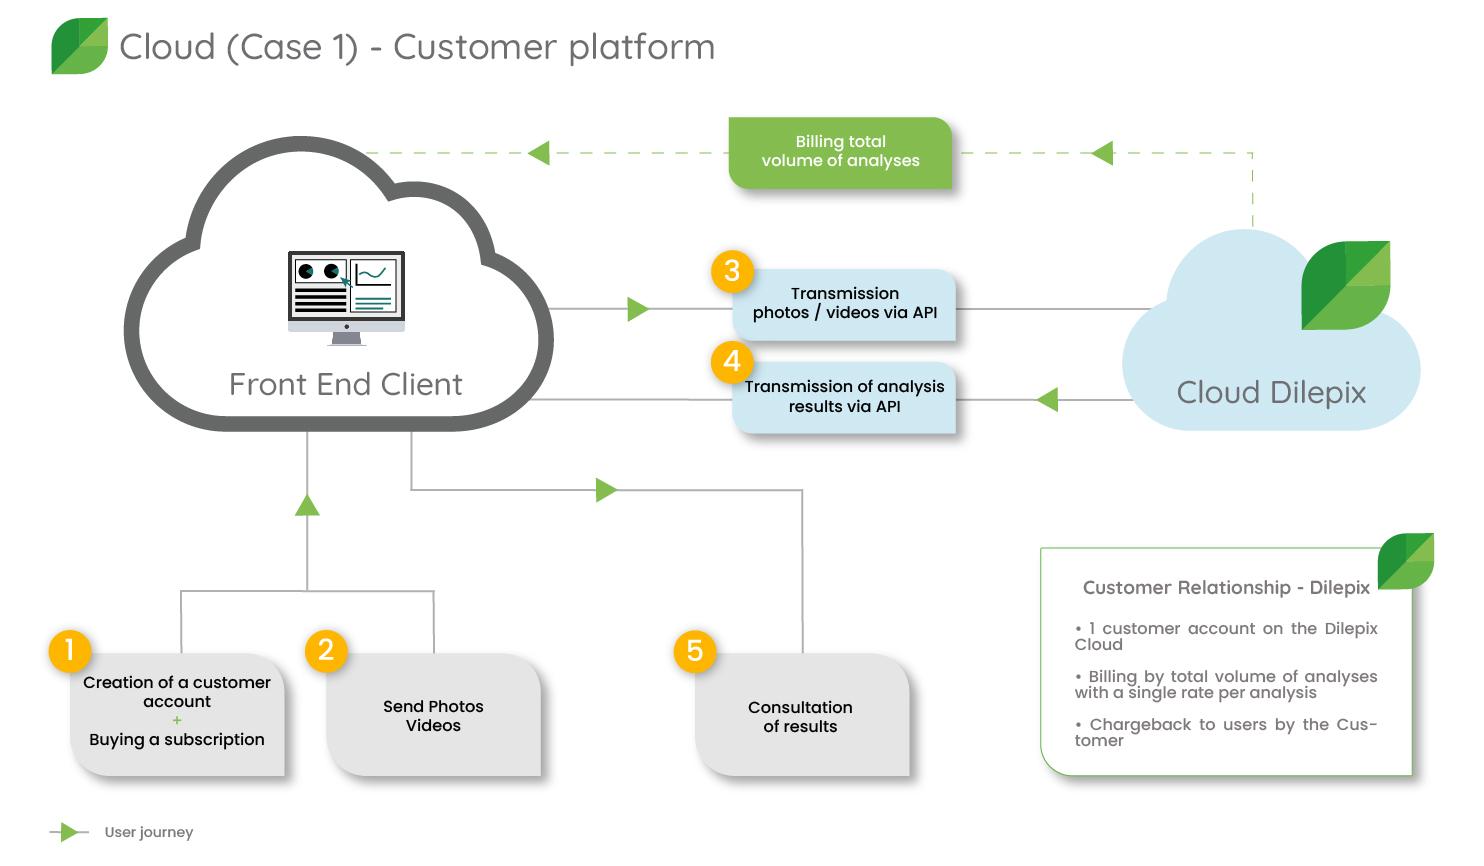 Dilepix Cloud scenario 1 customer platform